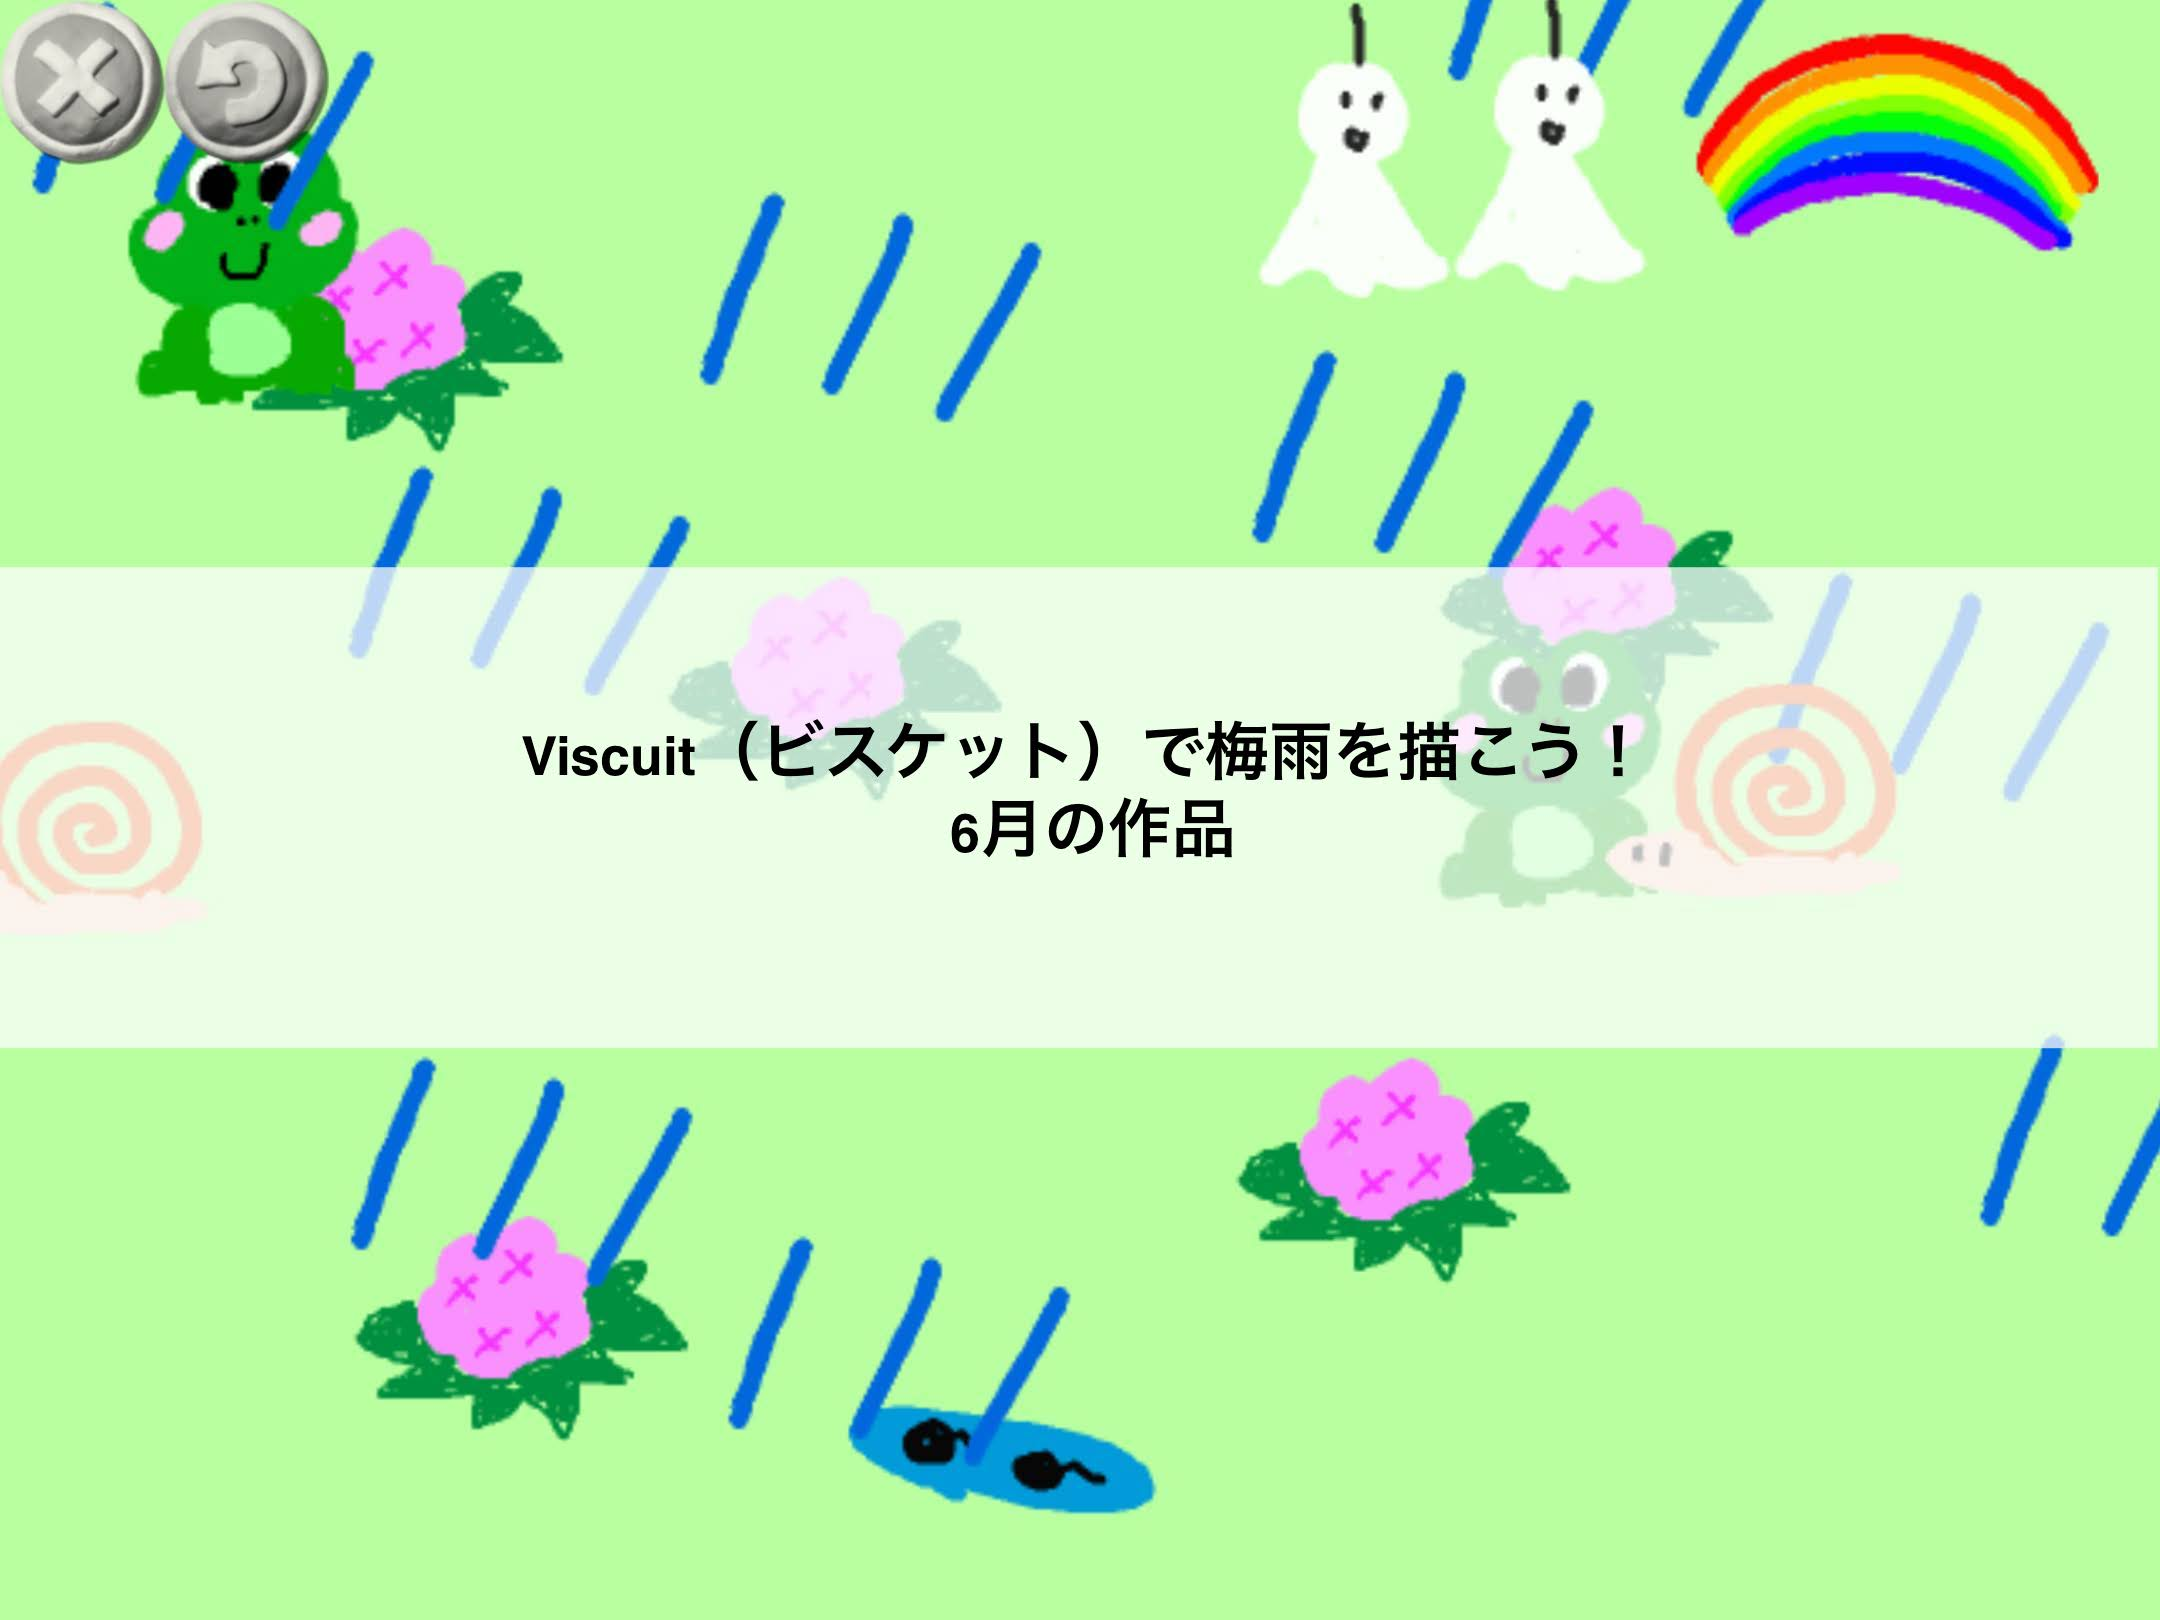 Viscuit(ビスケット)で梅雨を描こう☔ 6月の作品